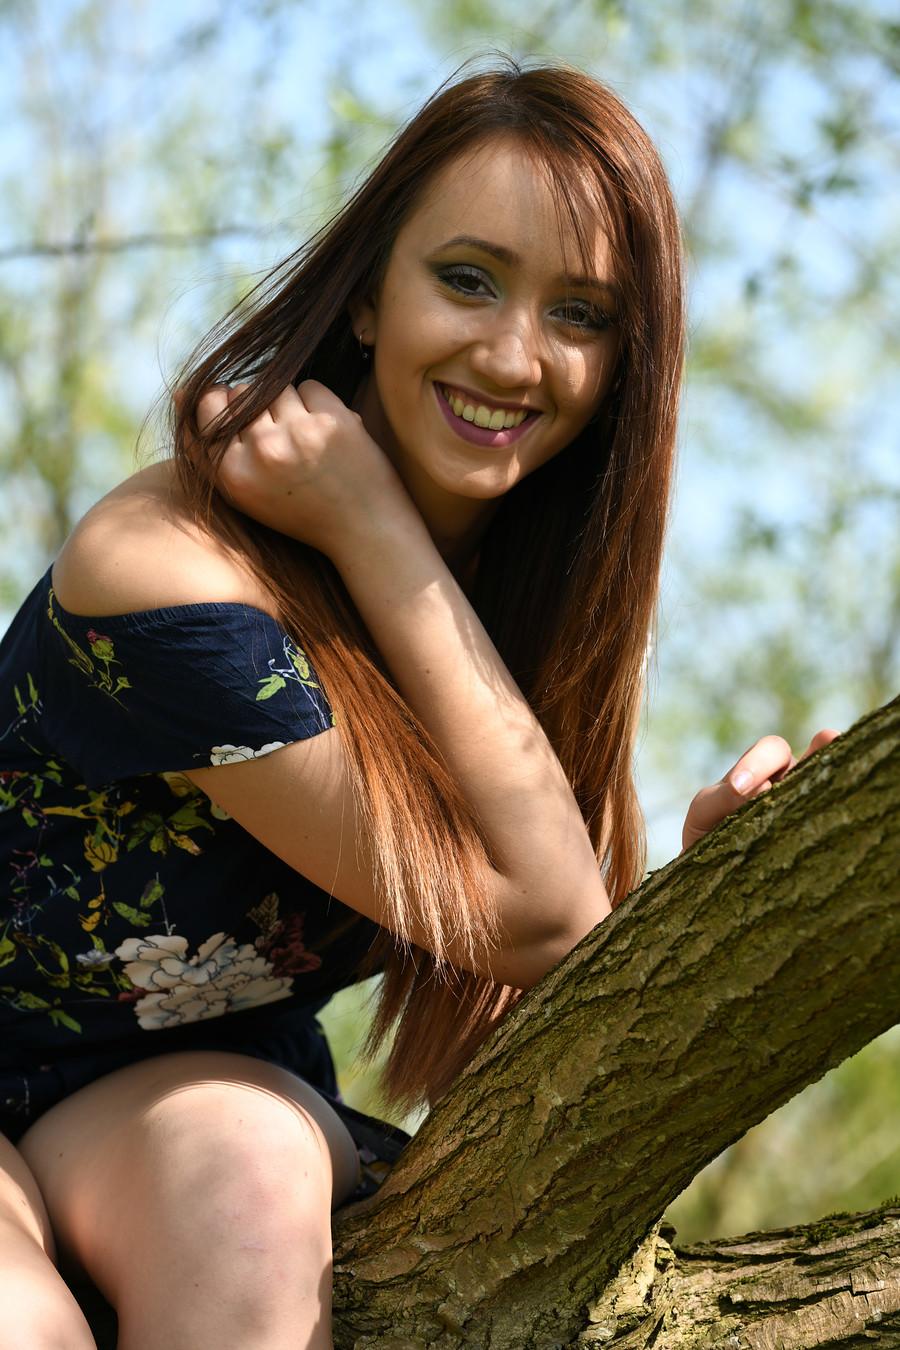 just smile! / Photography by Designer Photography, Model Sophie Alexandra / Uploaded 22nd April 2019 @ 09:16 PM